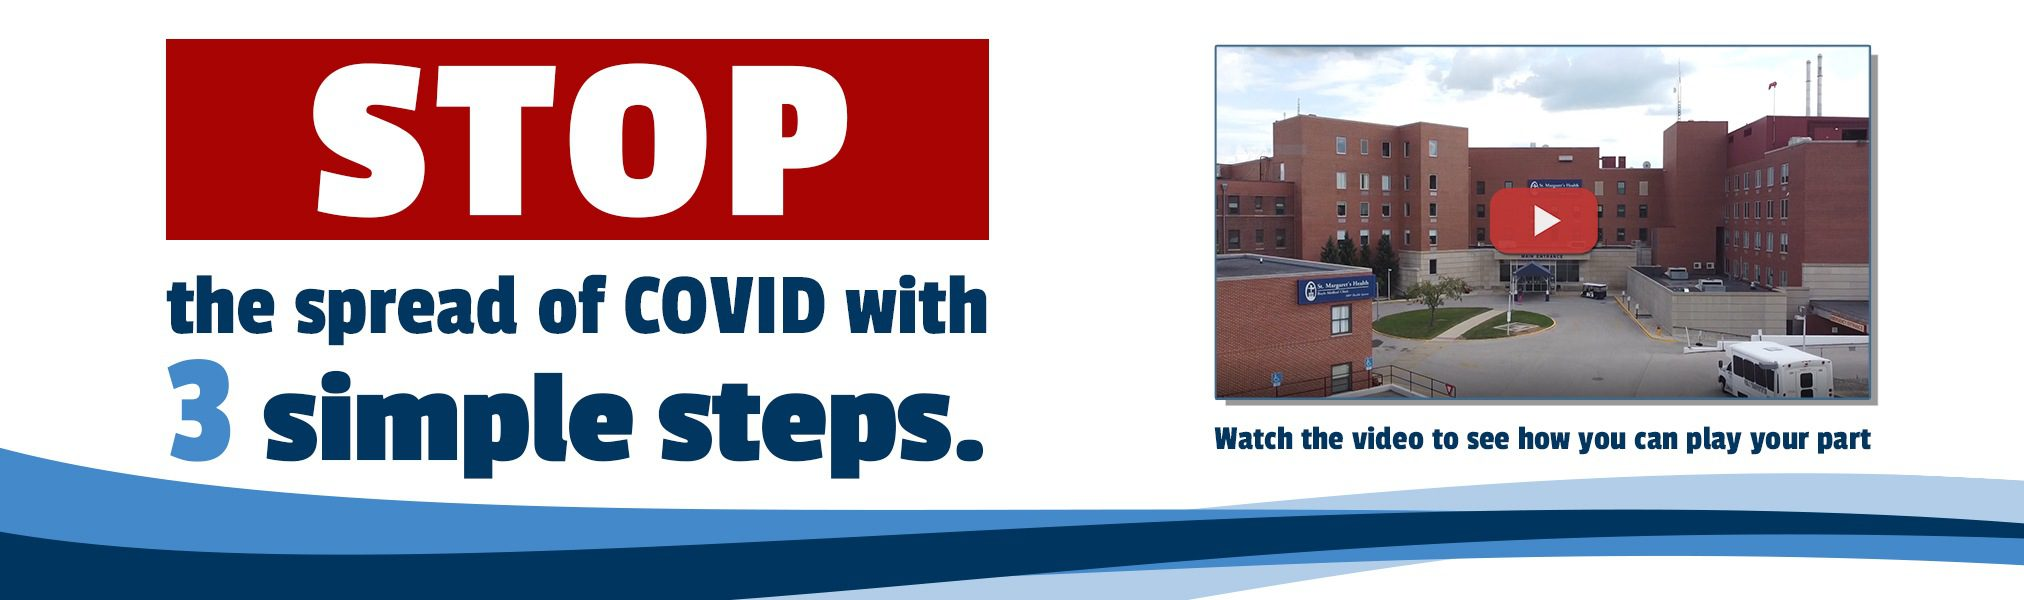 Stop COVID Video